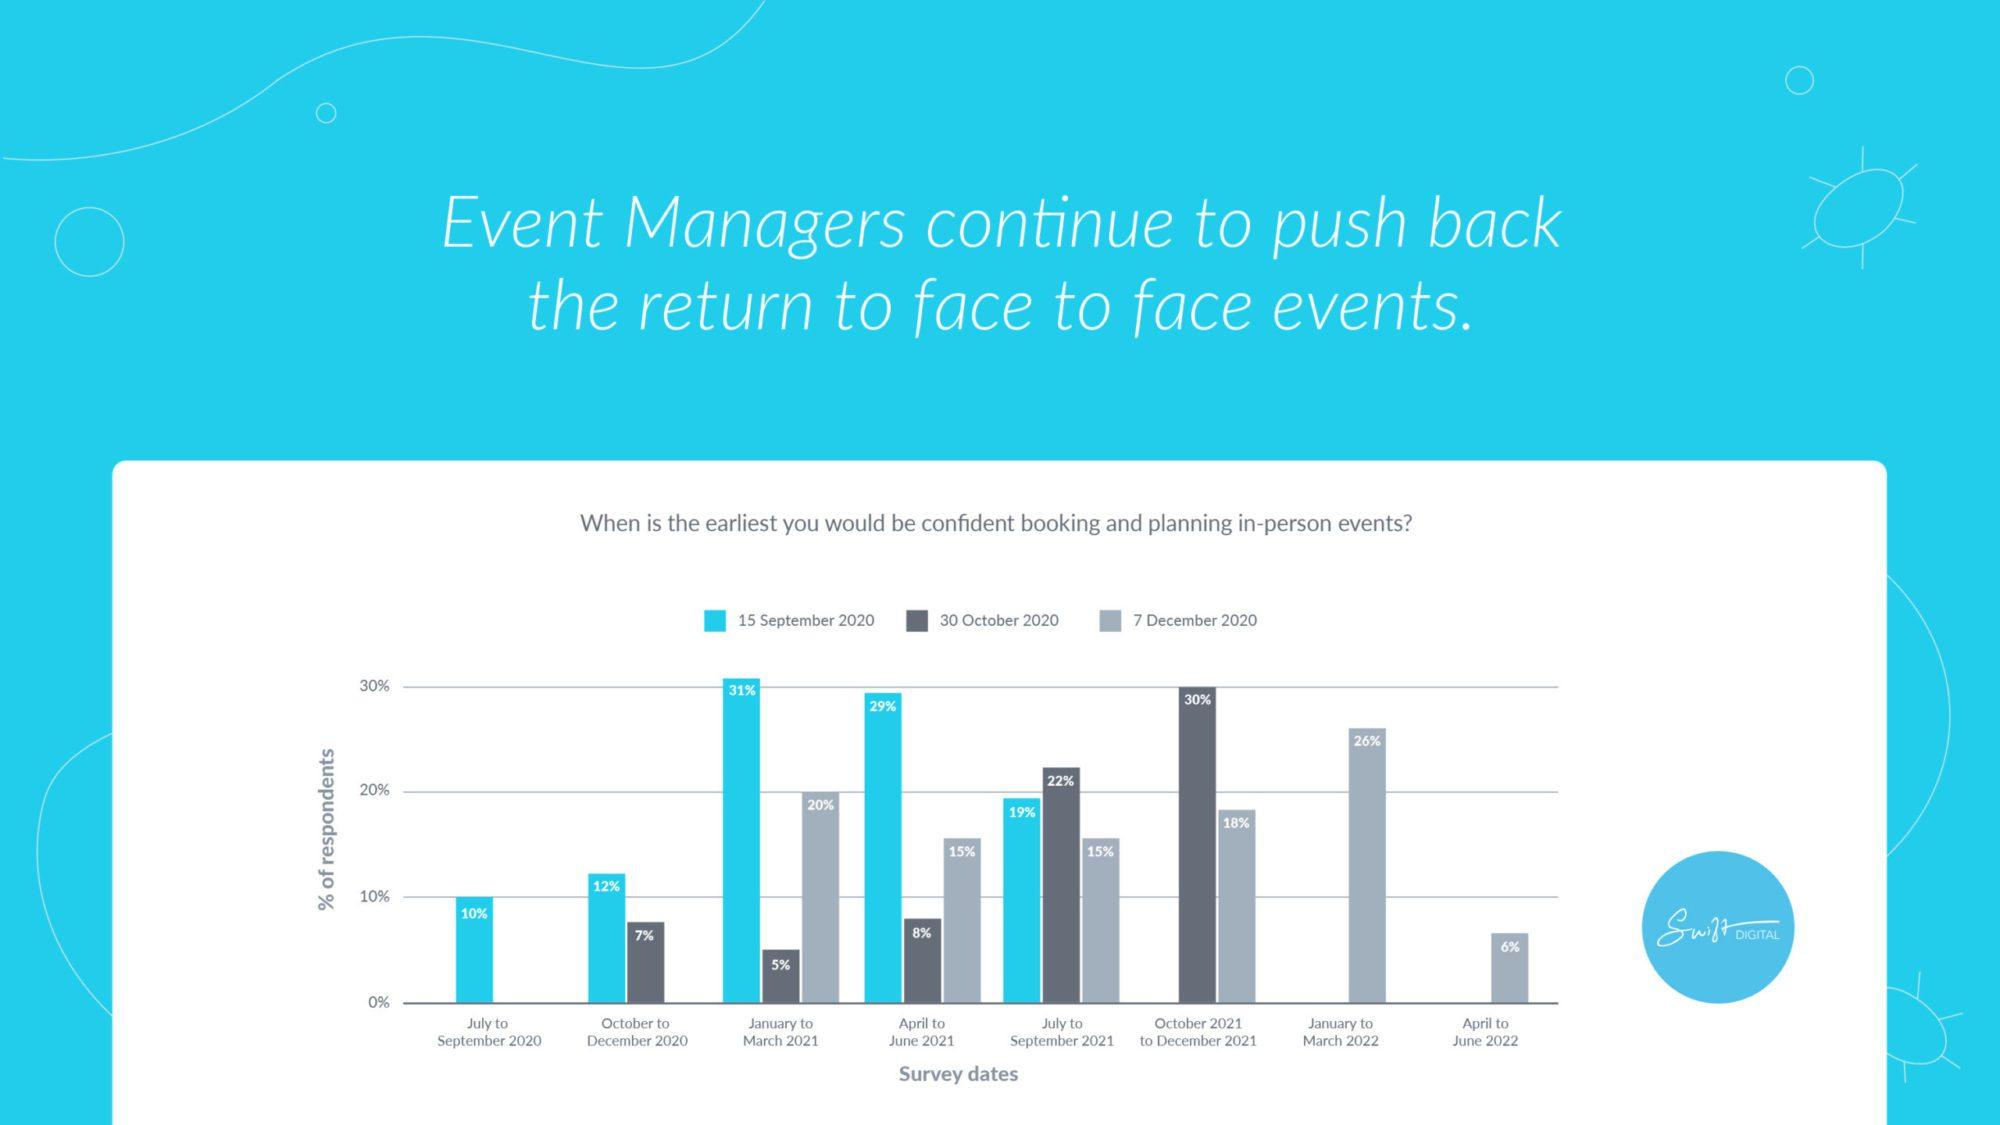 Swift Digital Virtual Events Australia Research 2021